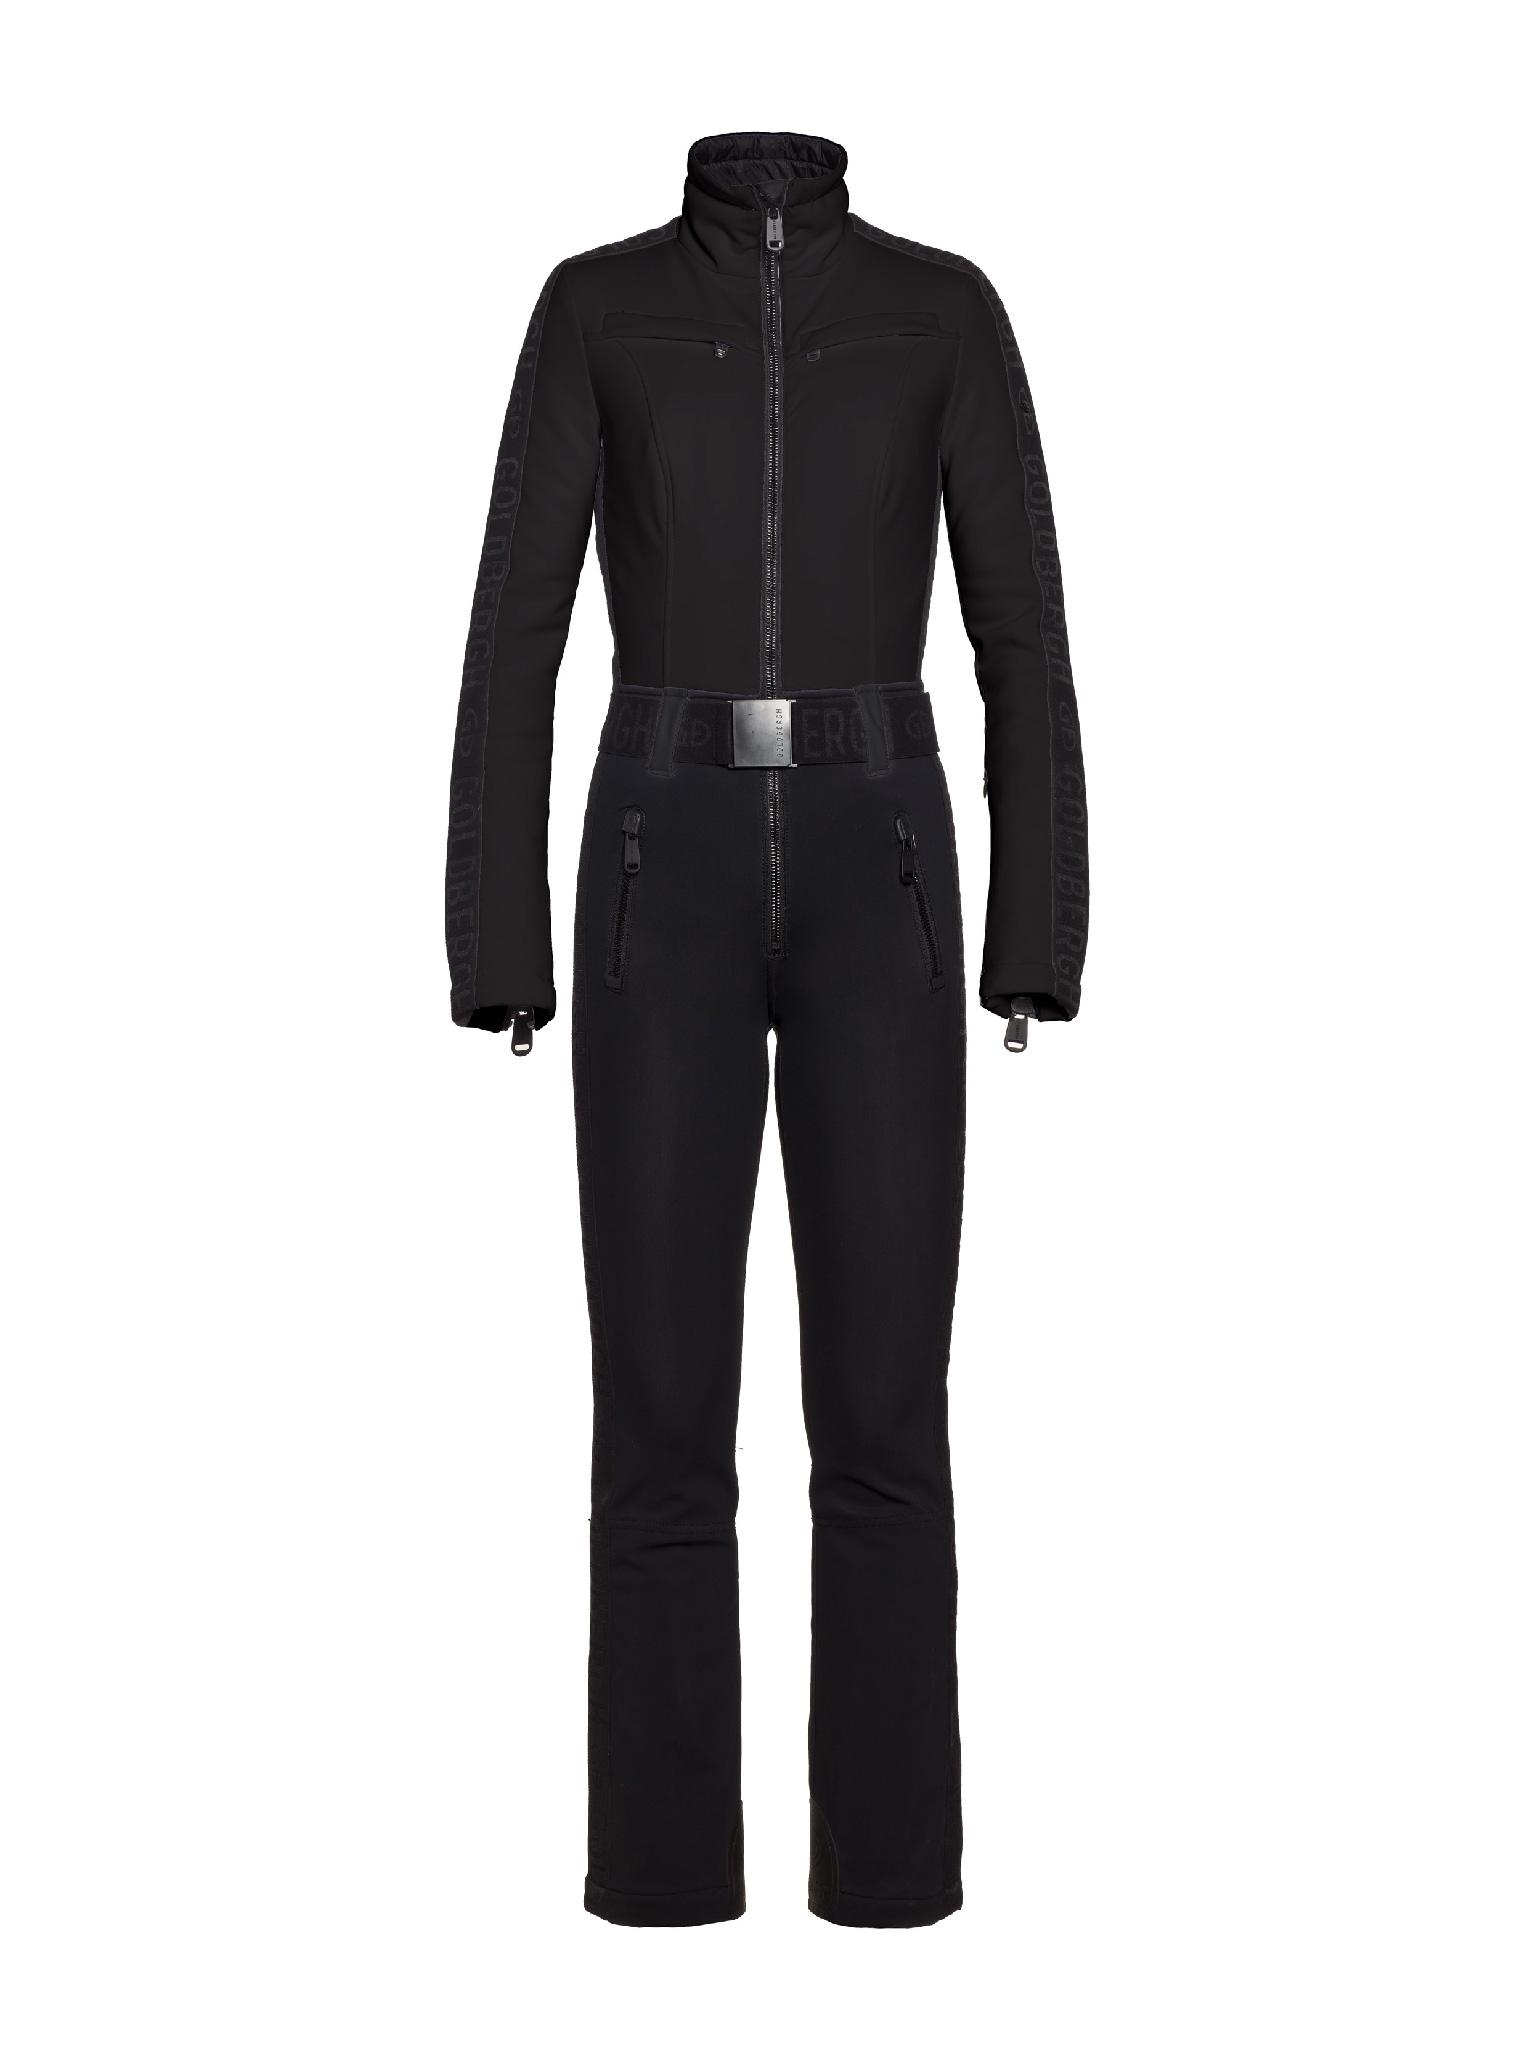 Goldbergh Goldfinger Ski Suit 2022